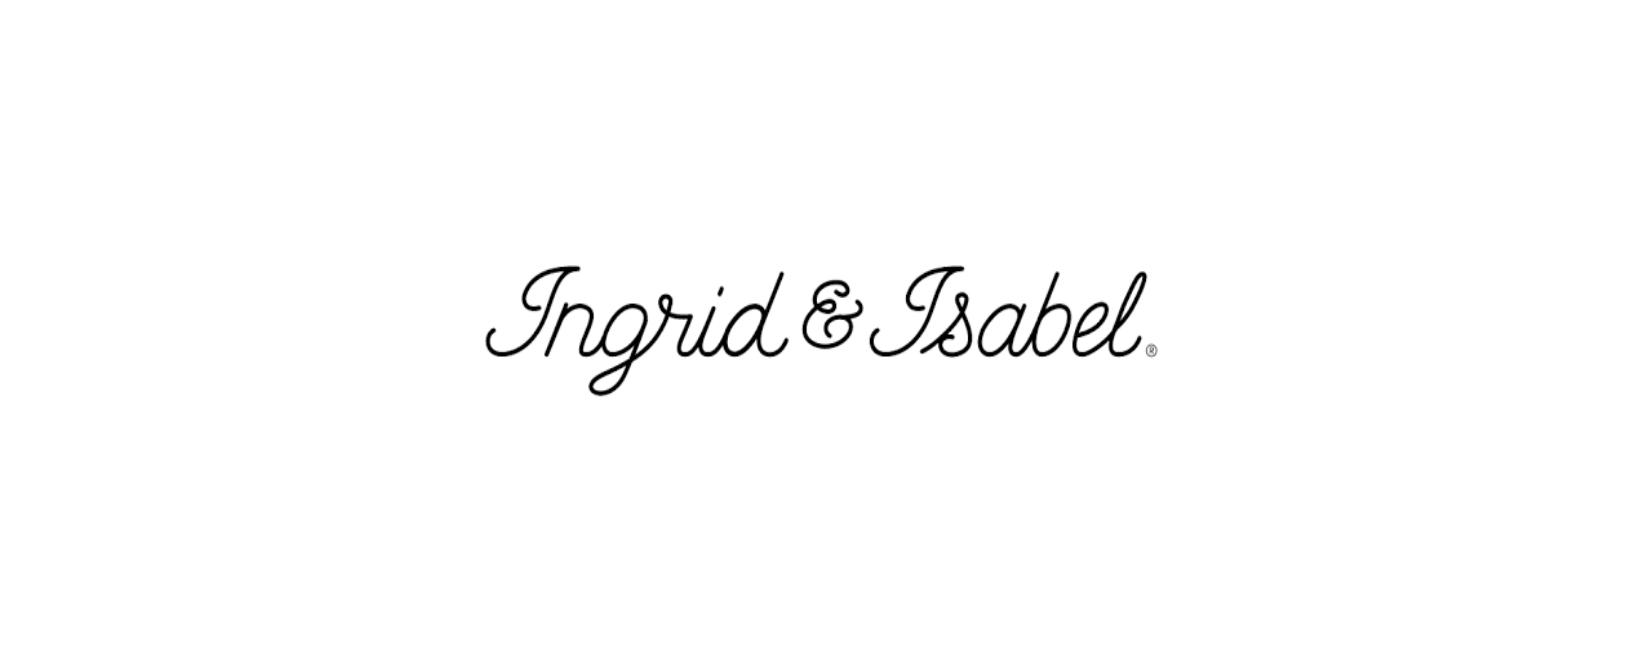 Ingrid & Isabel Discount Code 2021